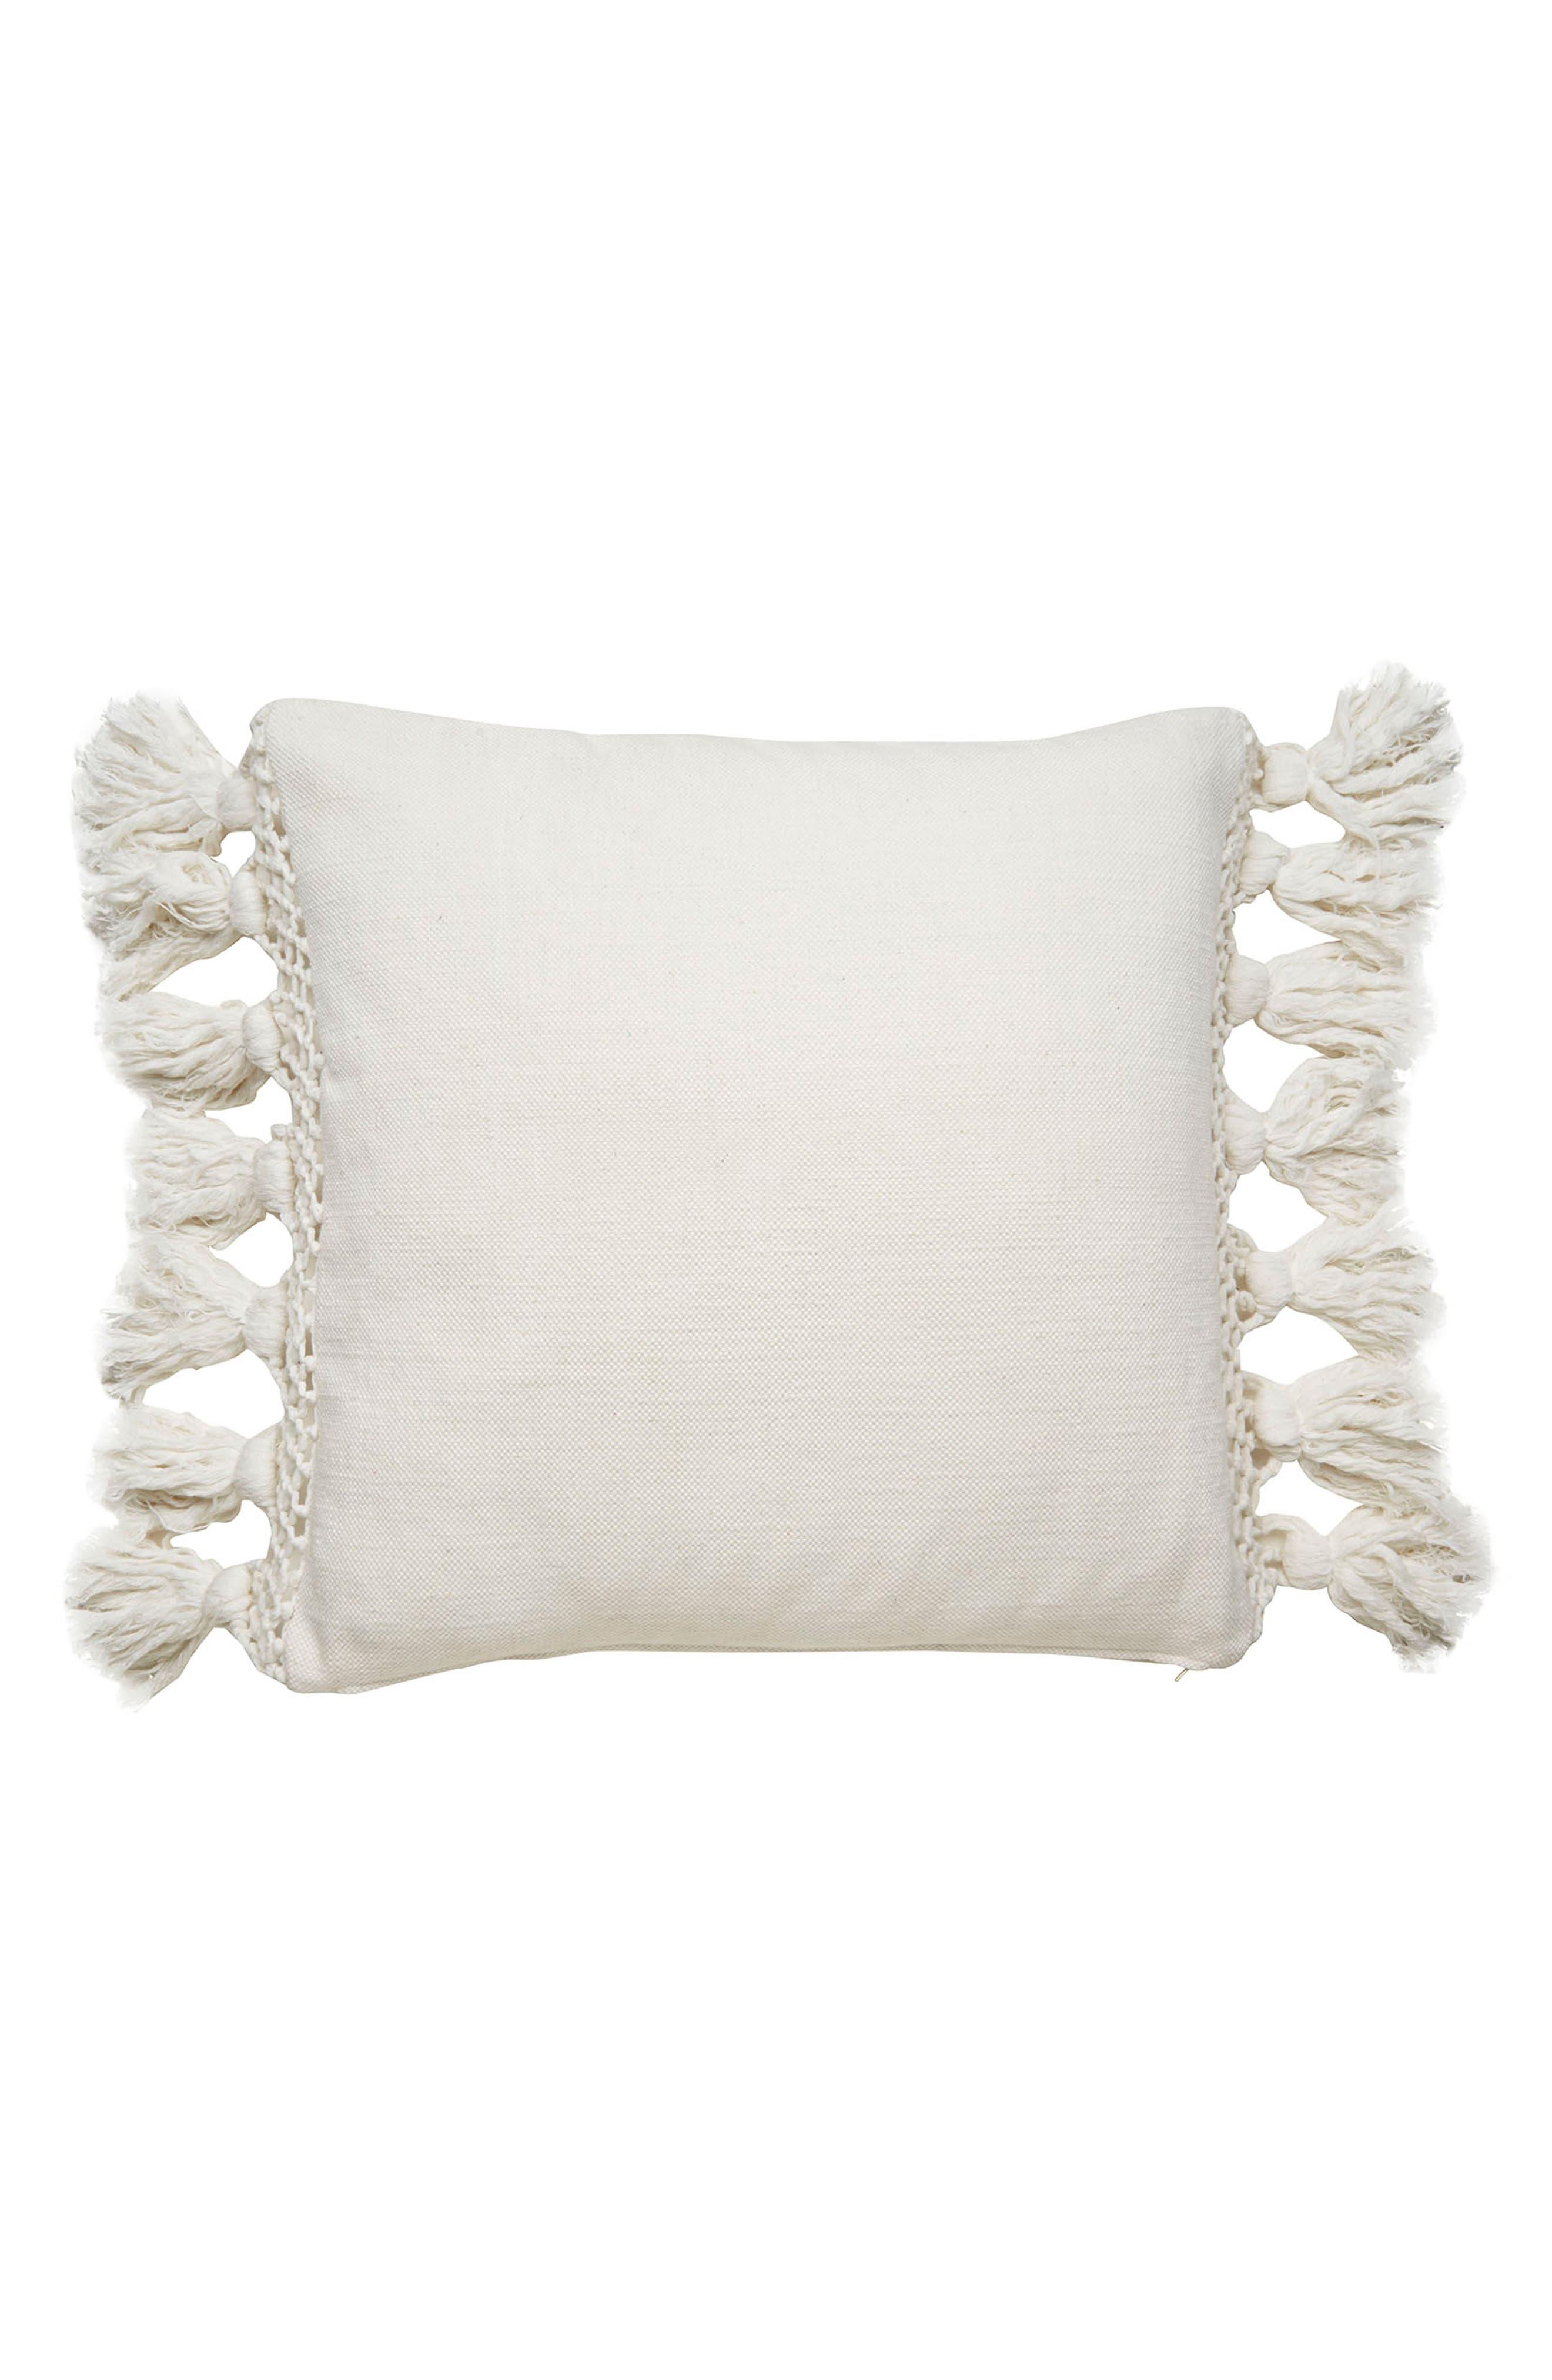 KATE SPADE NEW YORK,                             tassel pillow,                             Main thumbnail 1, color,                             100